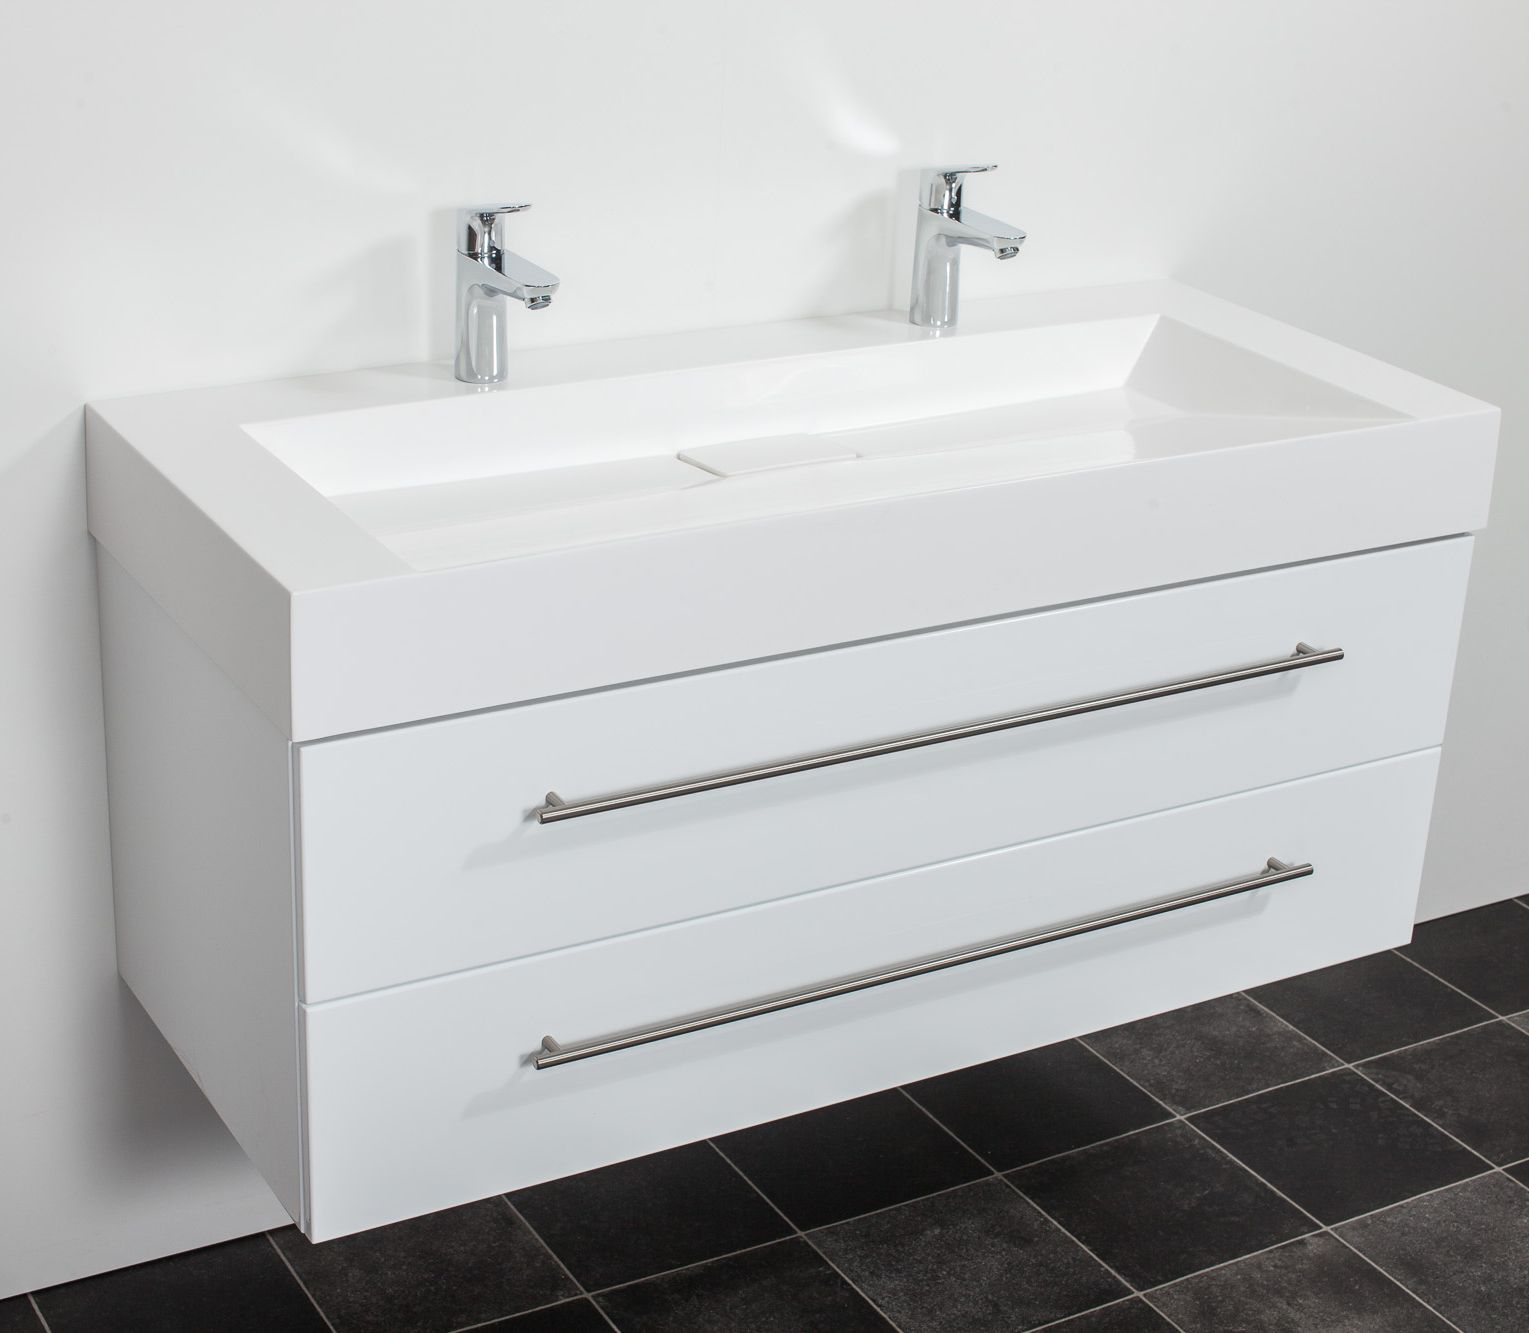 Saniclear Design wastafelmeubel 120cm 2 kranen hoogglans wit